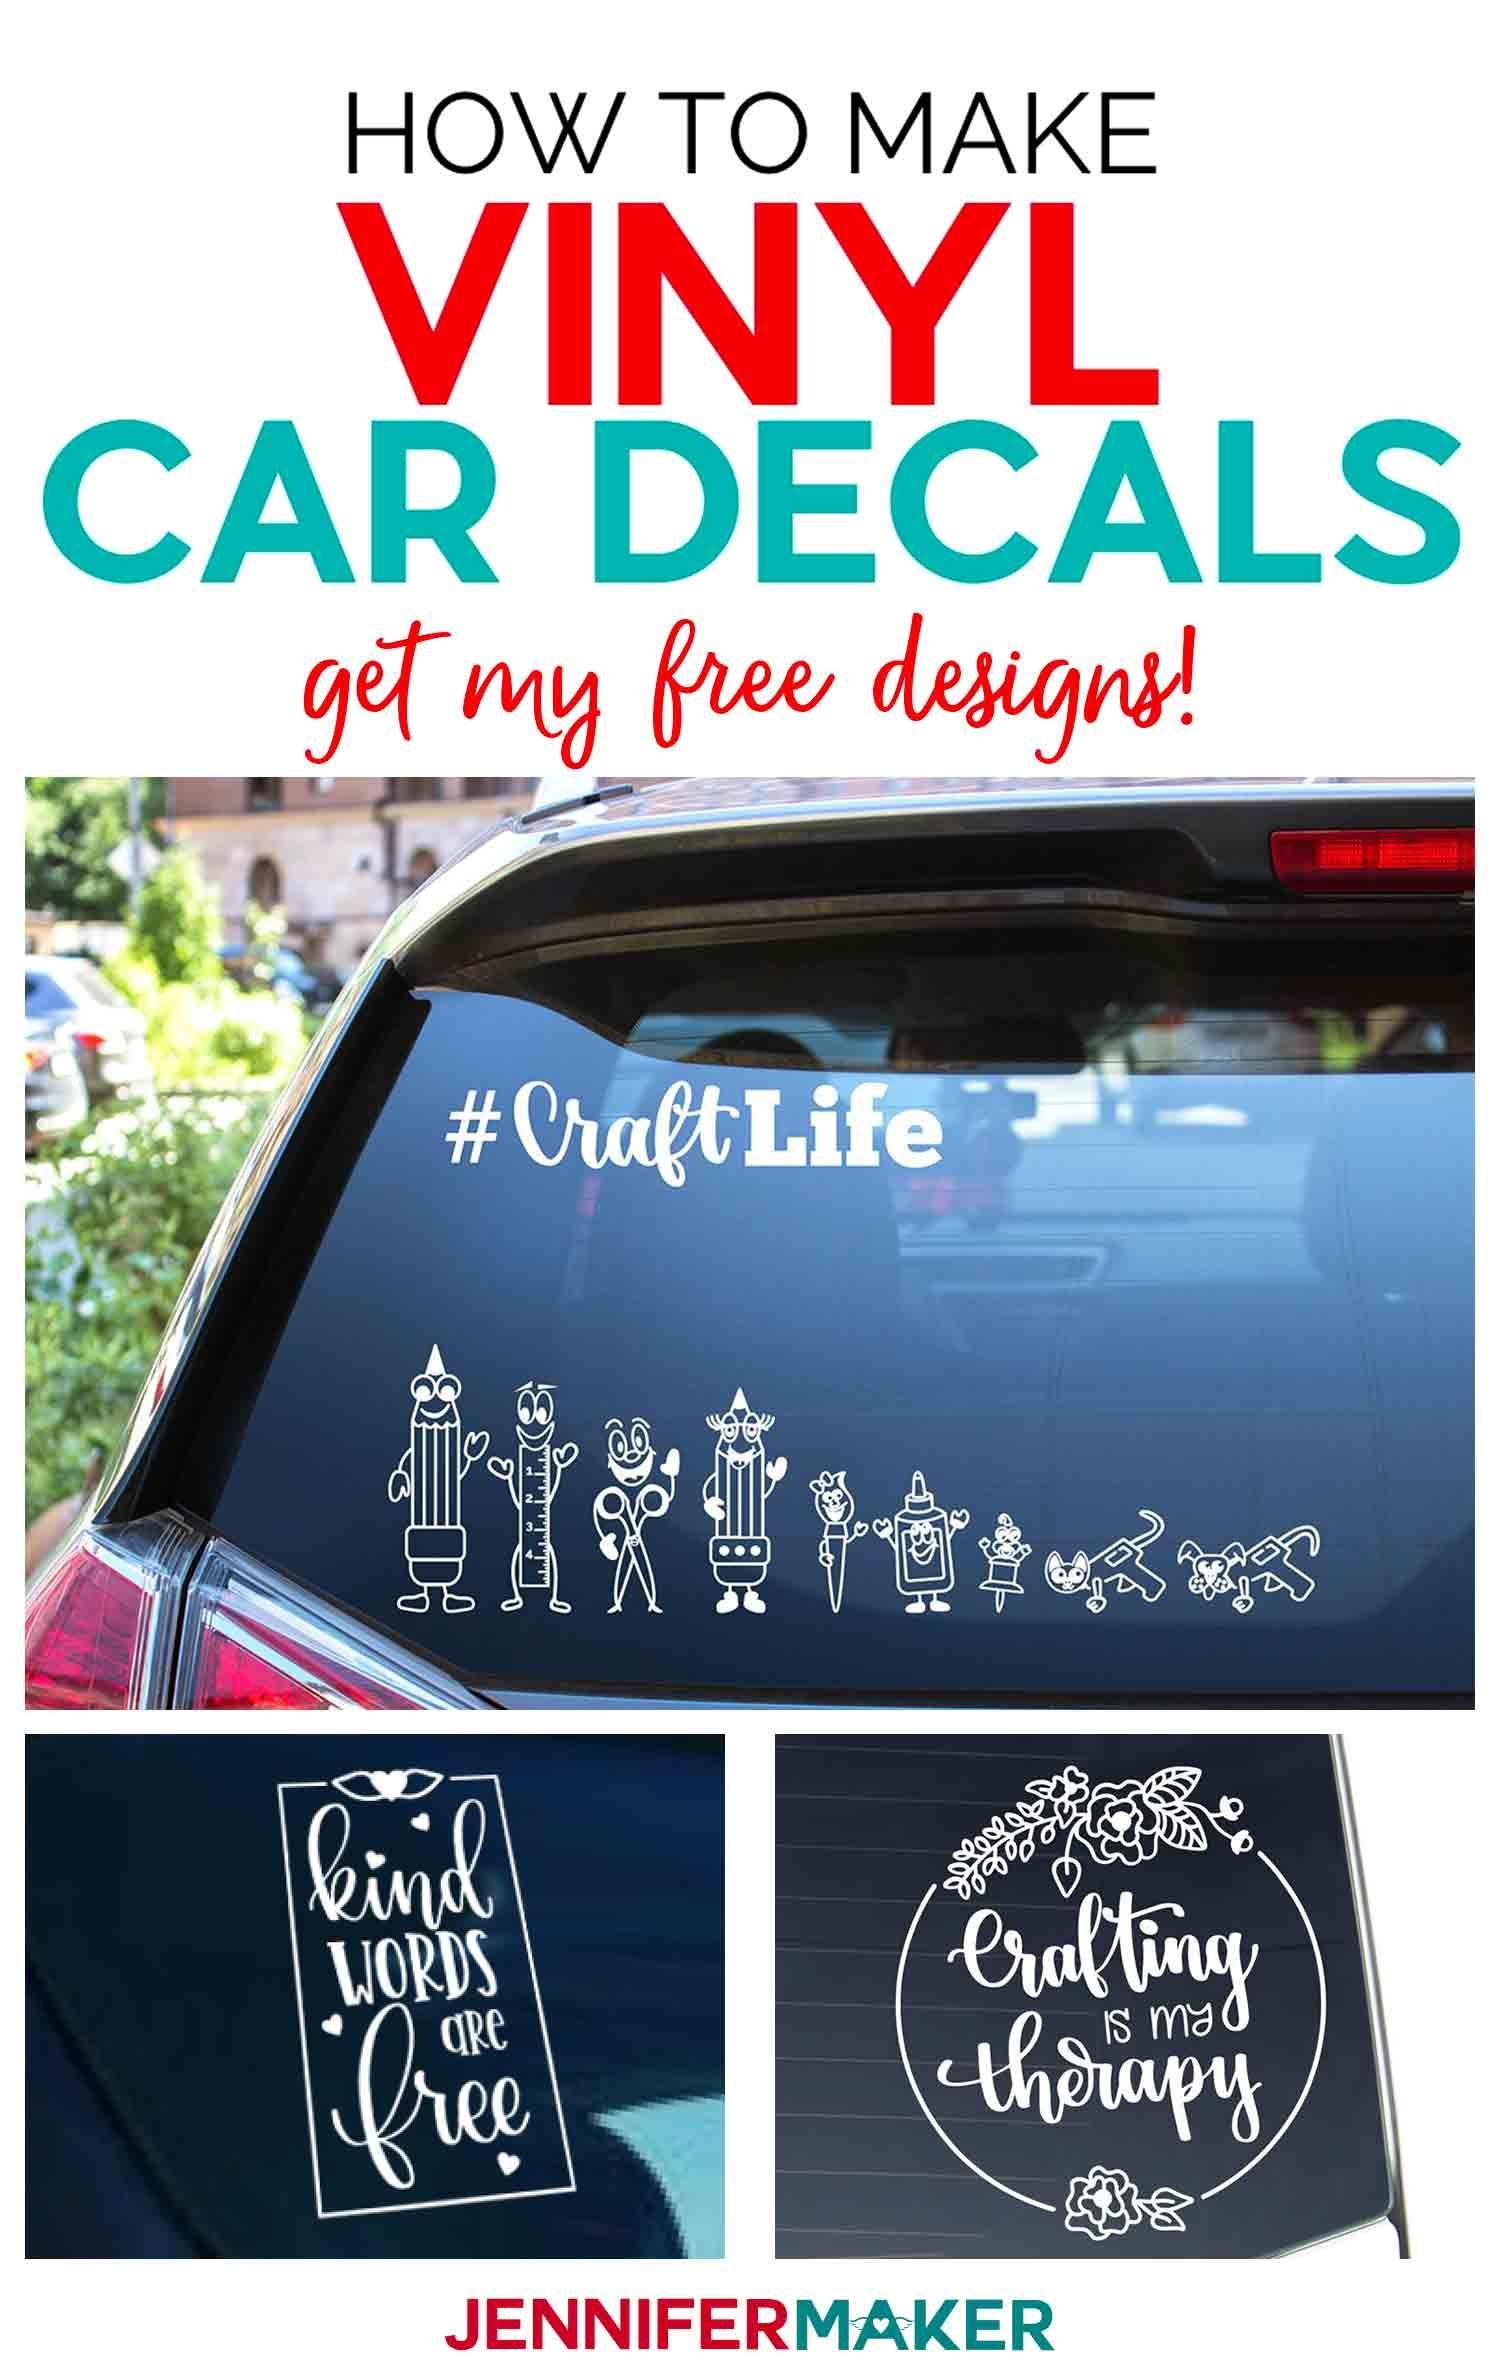 Vinyl Car Decals Quick And Easy To Make Your Own Jennifer Maker Car Decals Vinyl Cricut Projects Vinyl Car Decals [ 2376 x 1500 Pixel ]